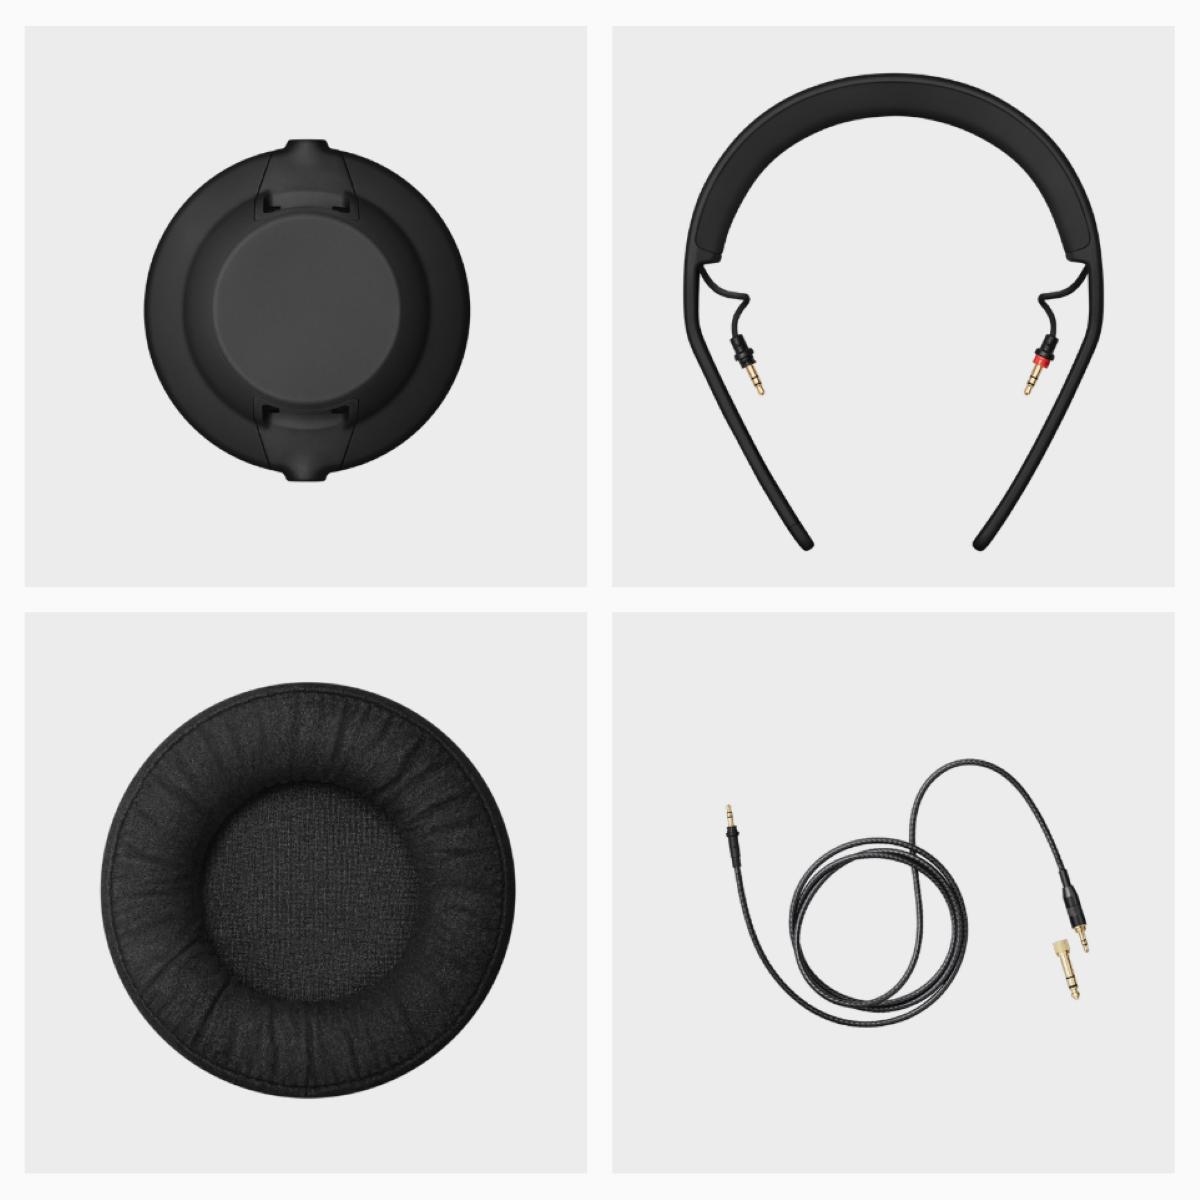 TMA-2 HD wireless bluetooth earphones - Box Contents